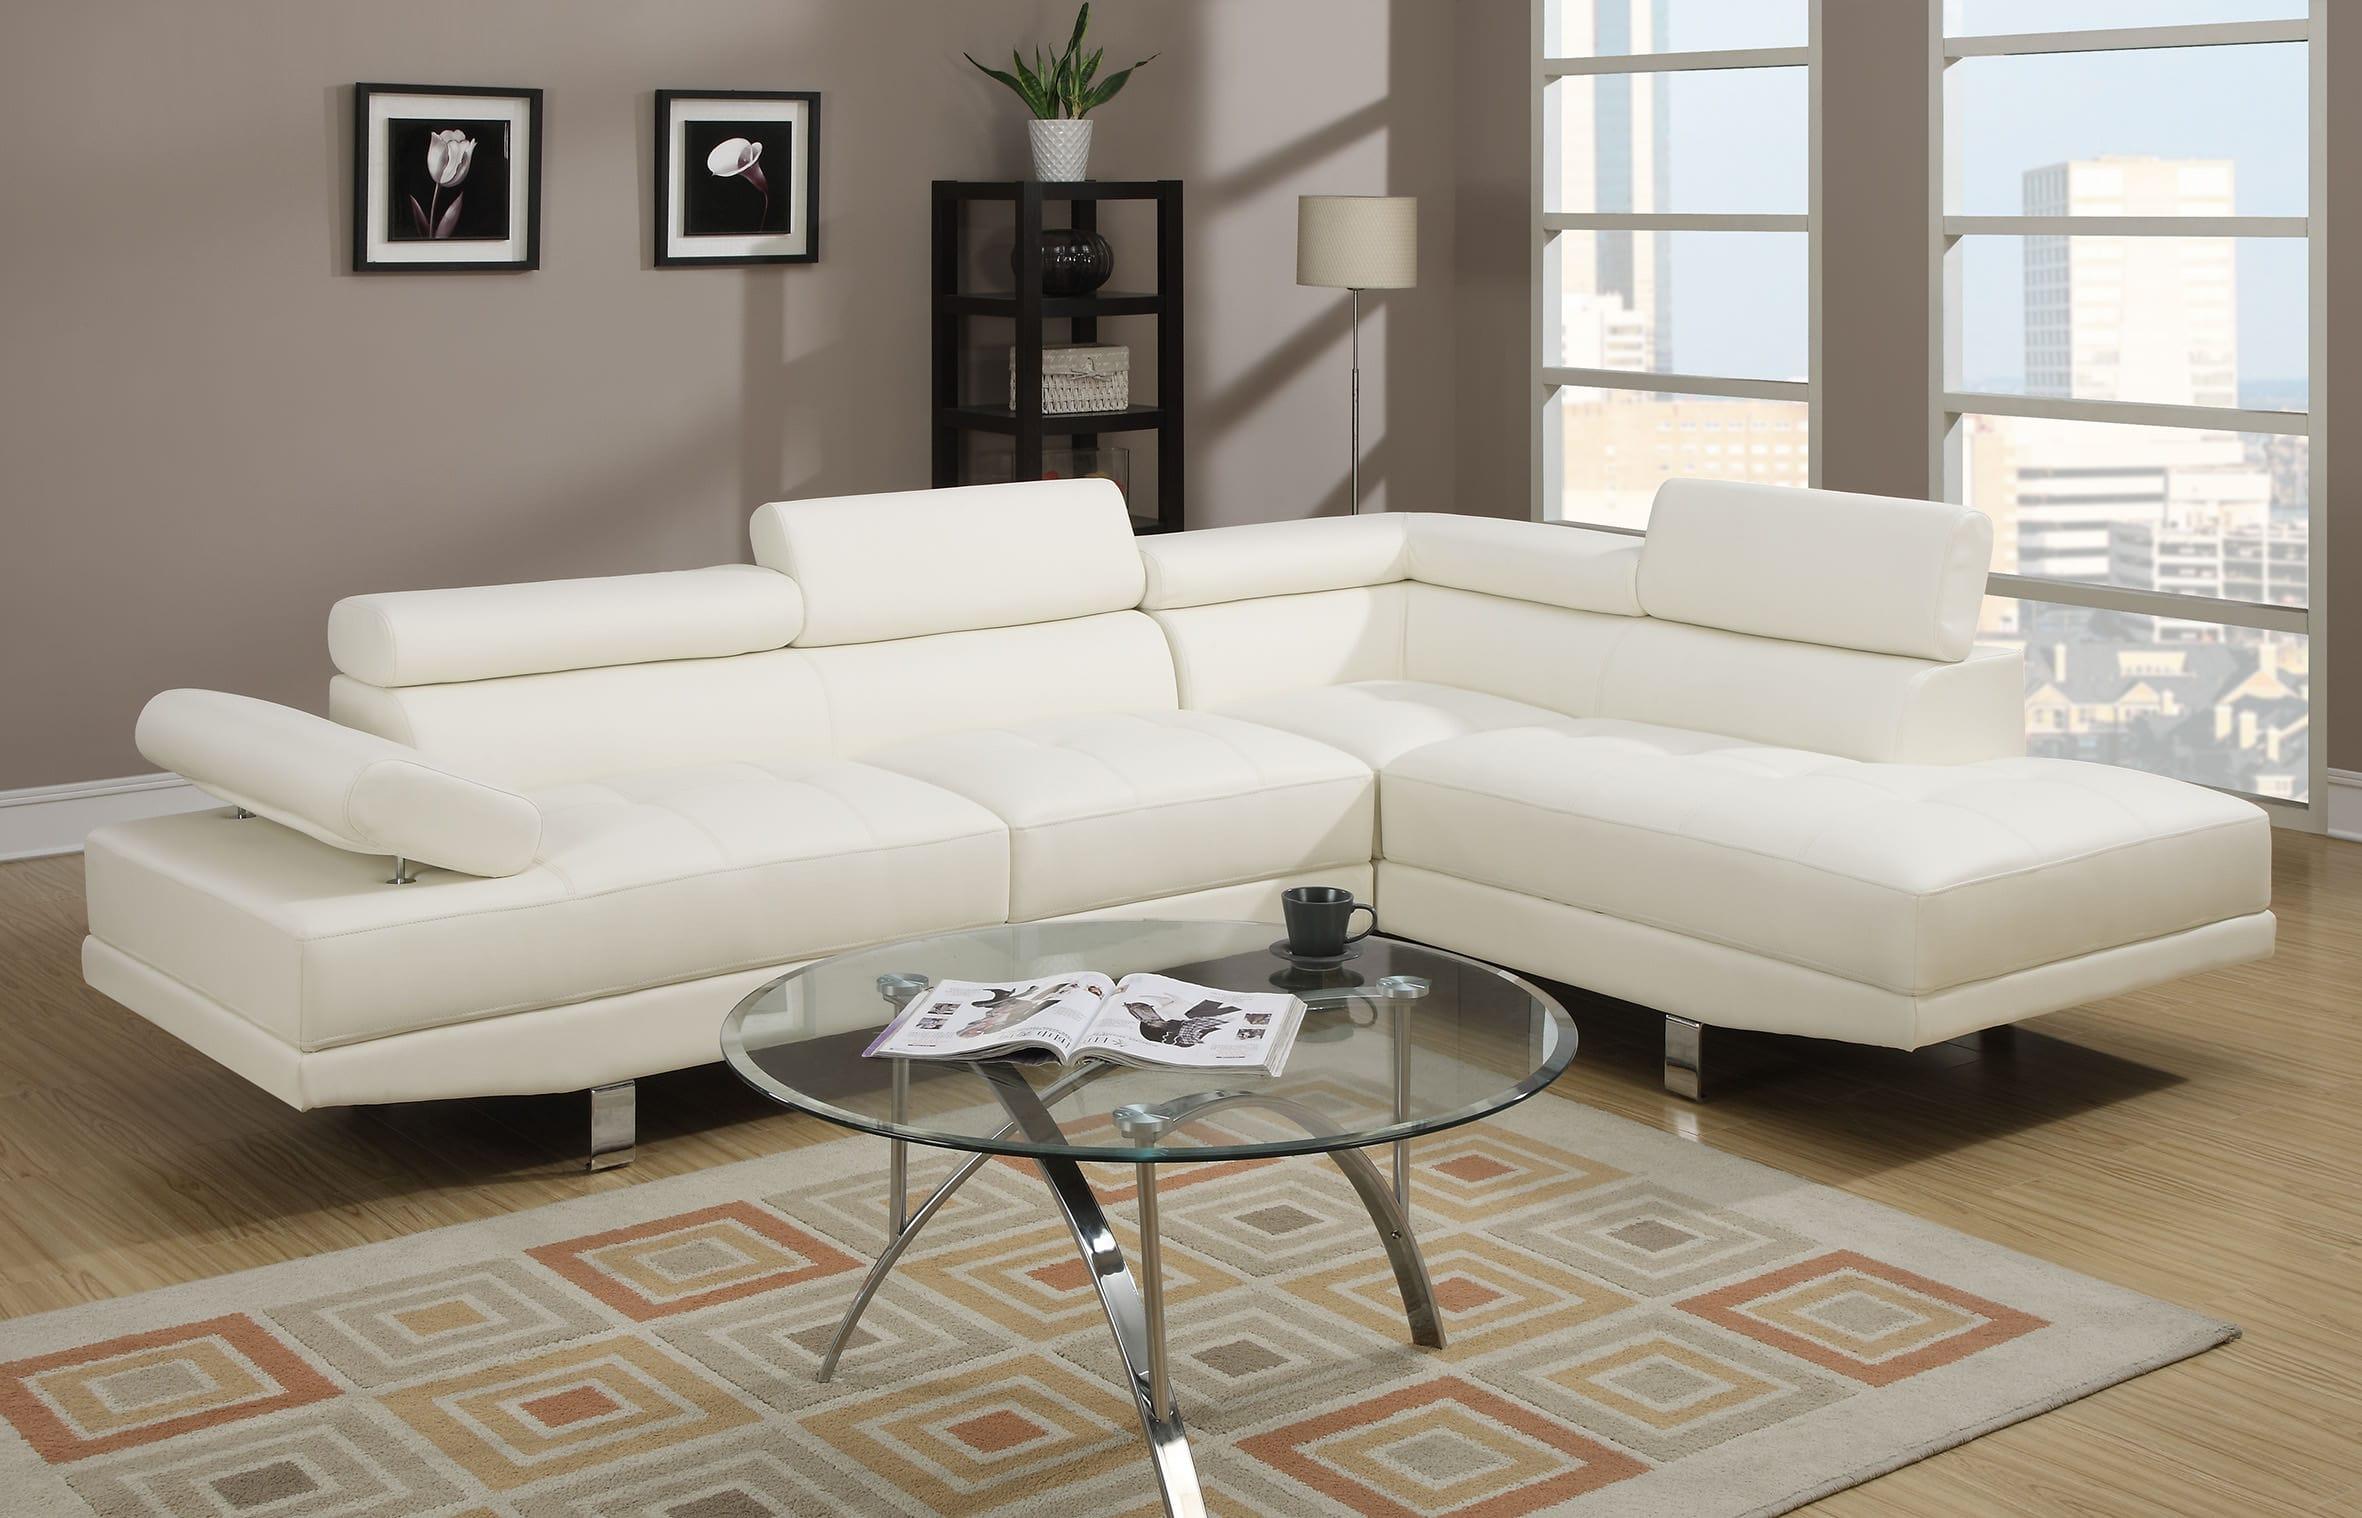 Tremendous F7320 White Sectional Sofa By Poundex Uwap Interior Chair Design Uwaporg